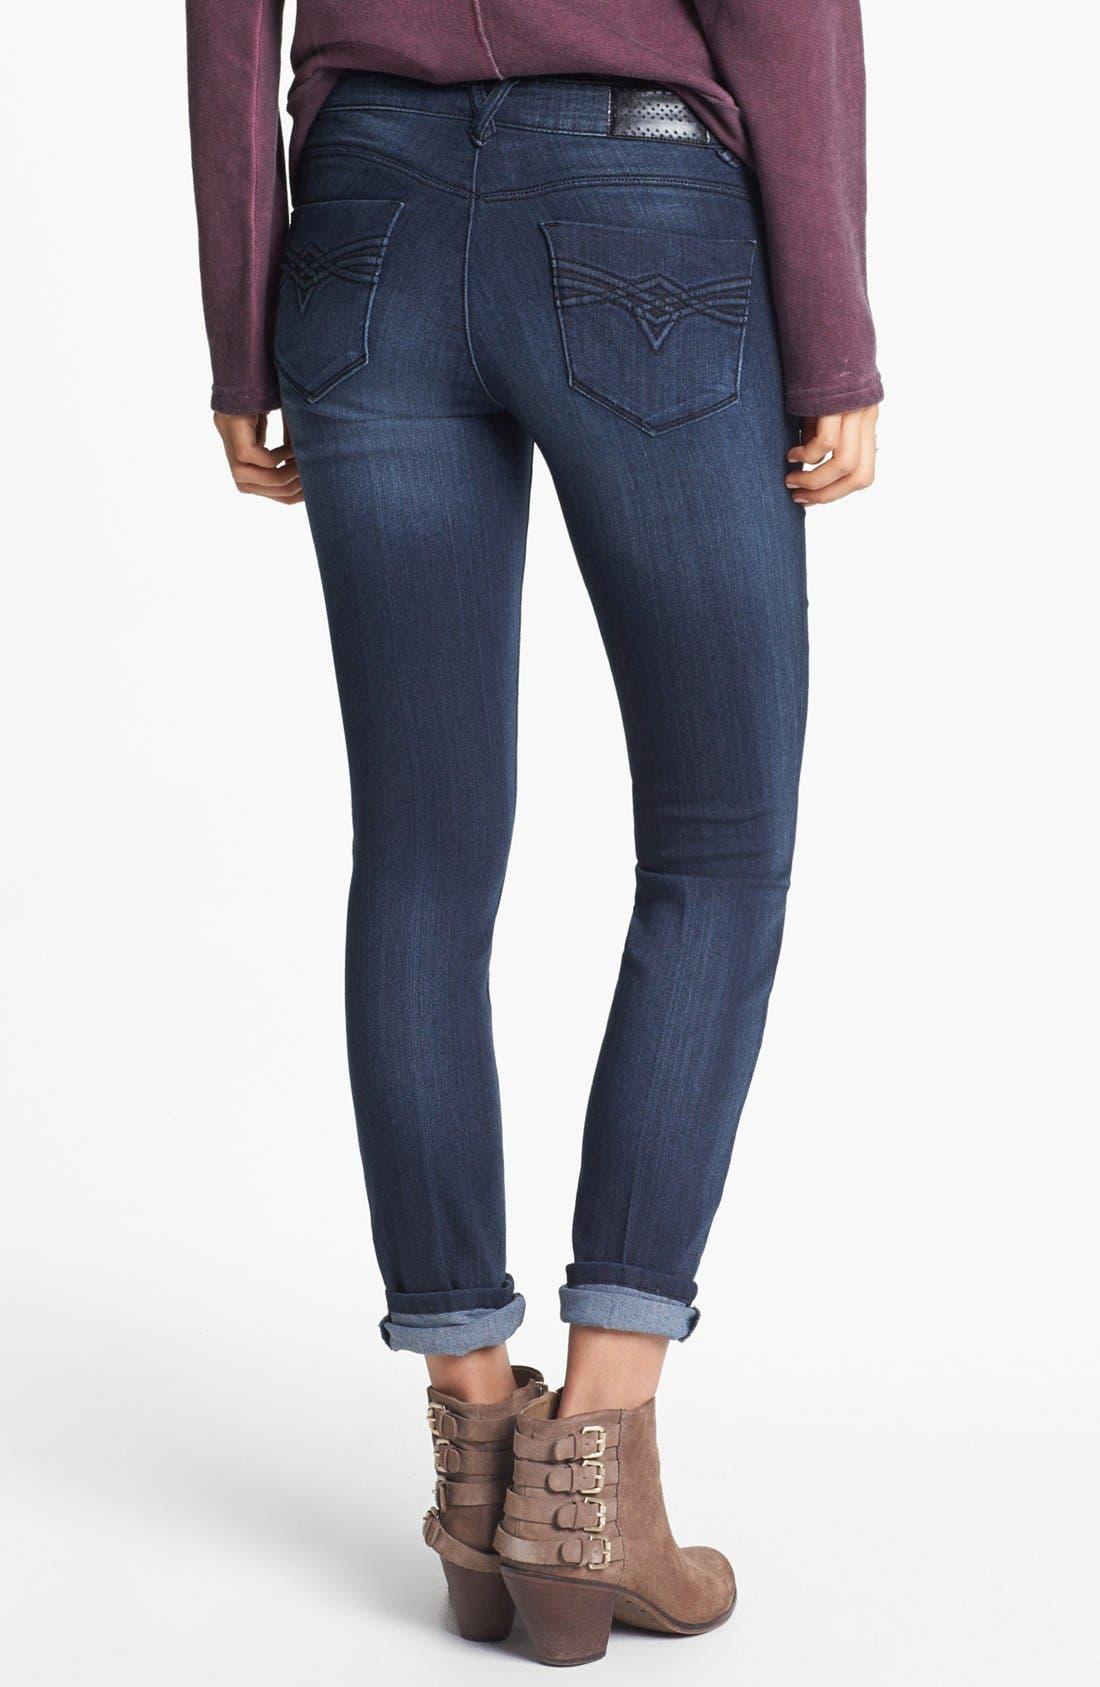 Main Image - Jolt 'Aircord' Embroidered Pocket Skinny Jeans (Dark) (Juniors)